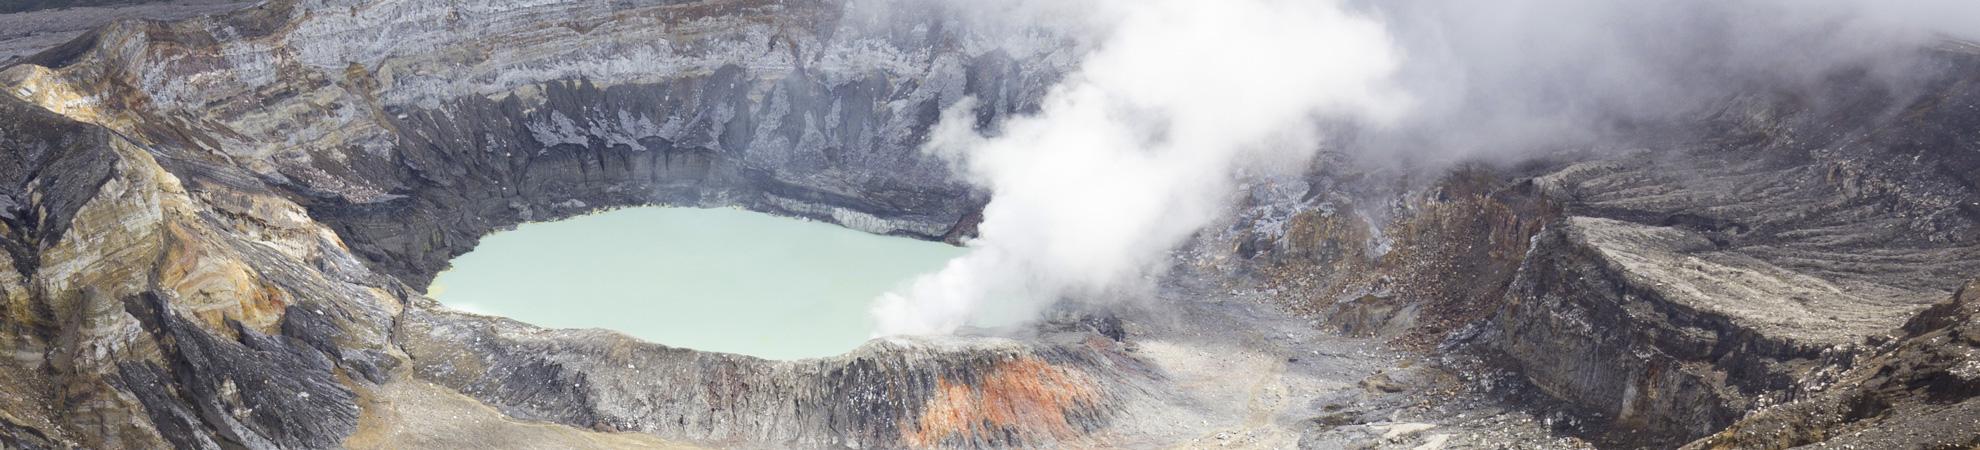 Les risques naturels au Costa Rica